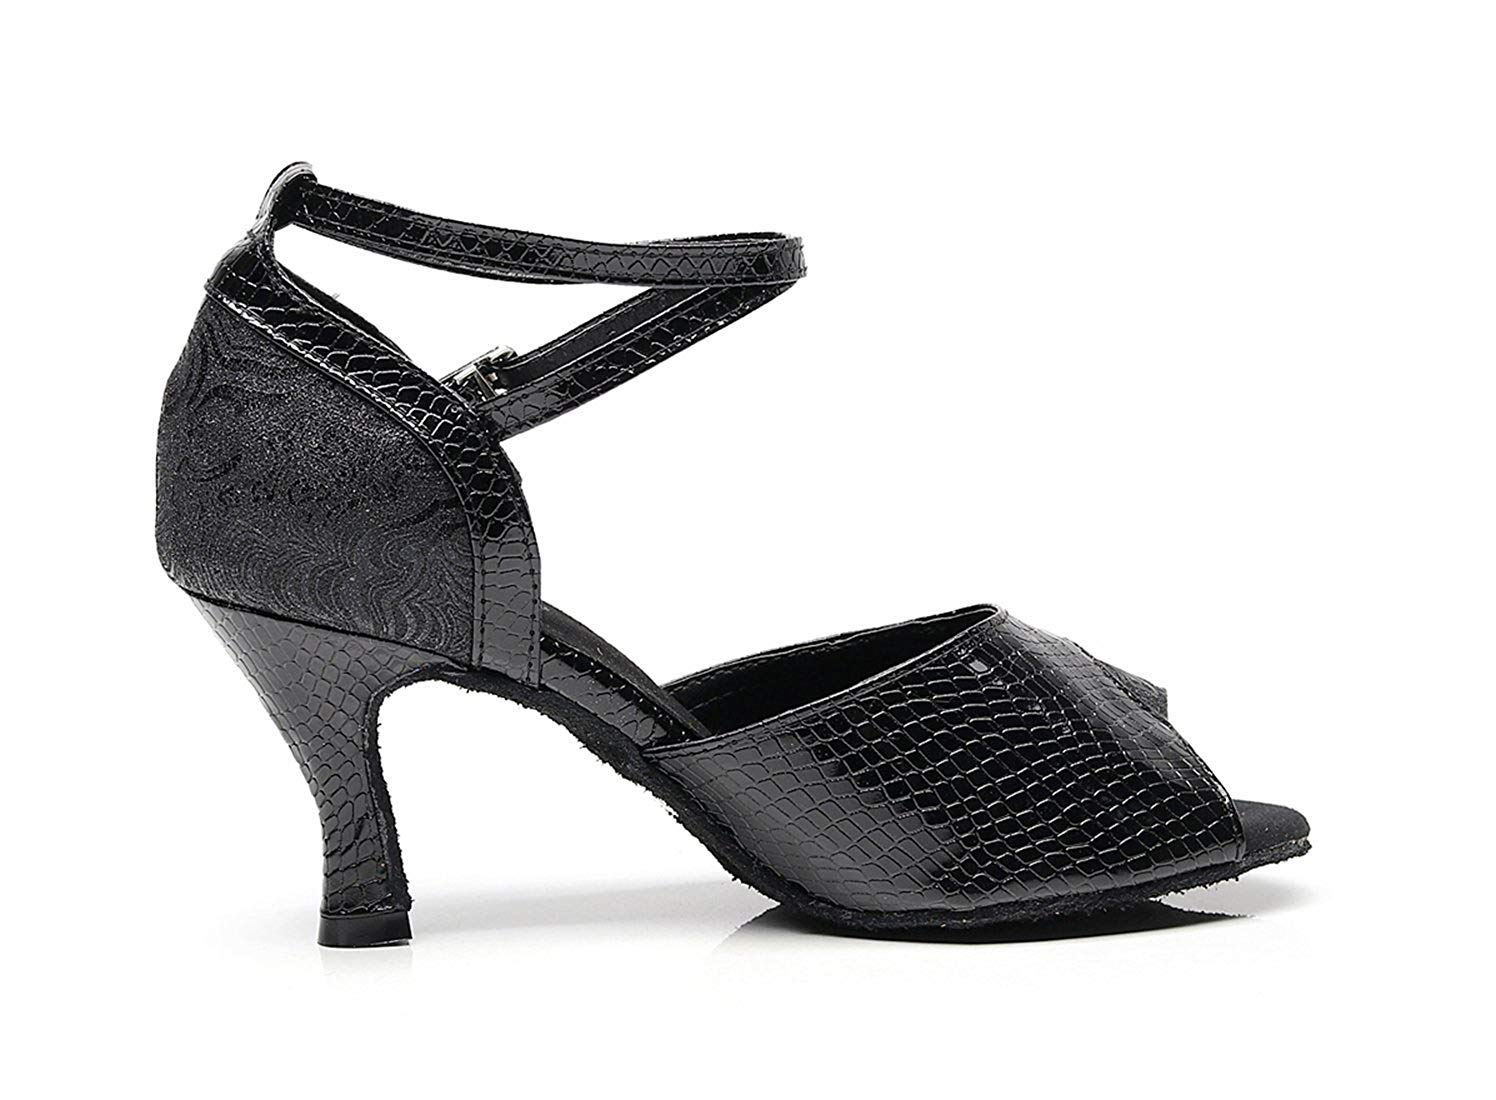 Damen Handgemachte Mode Knöchelriemen Schwarz Synthetische Latin Salsa Salsa Latin Ballroom Tanzen Sandalen UK 7 5 (Farbe   Gold-4  Heel Größe   -) aa7e81